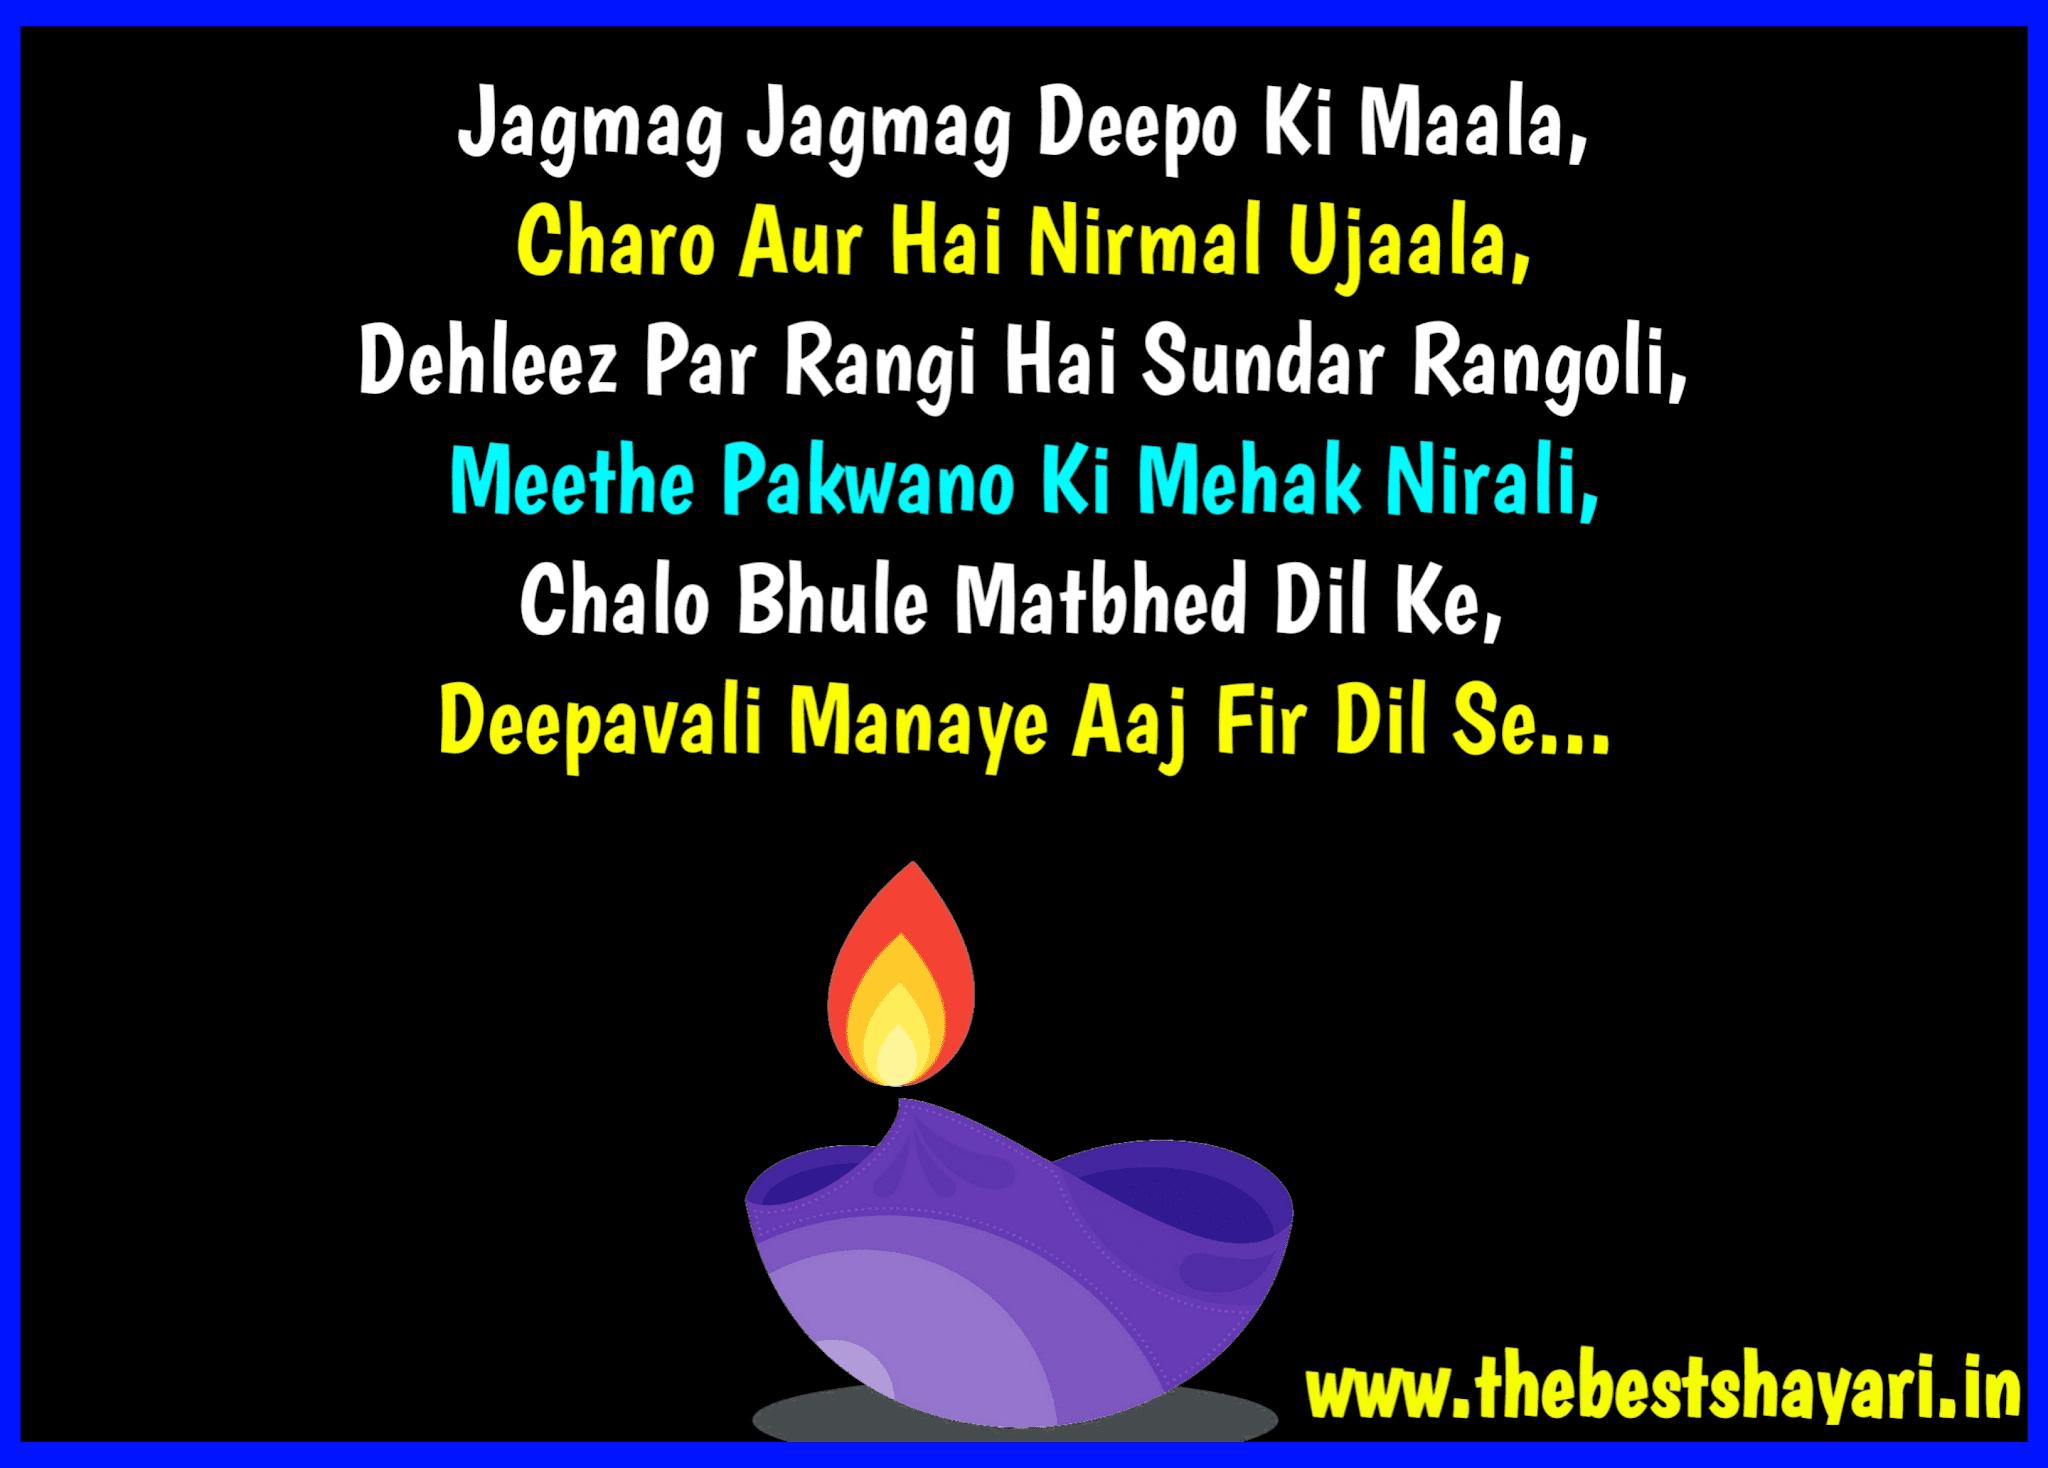 diwali wishing messages